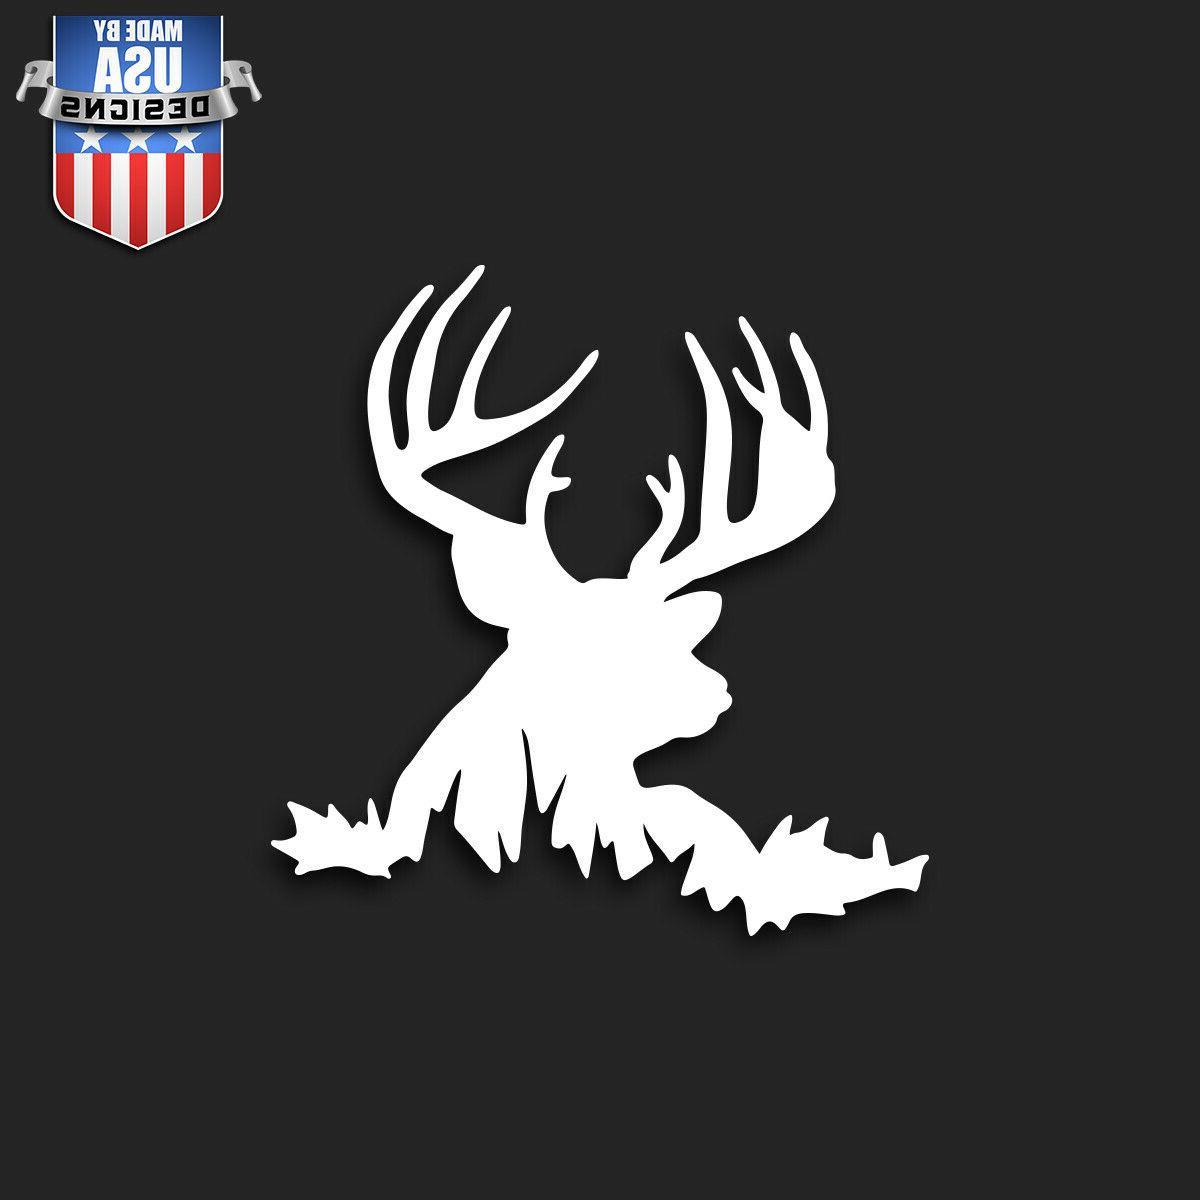 deer buck in brush sticker decal phone